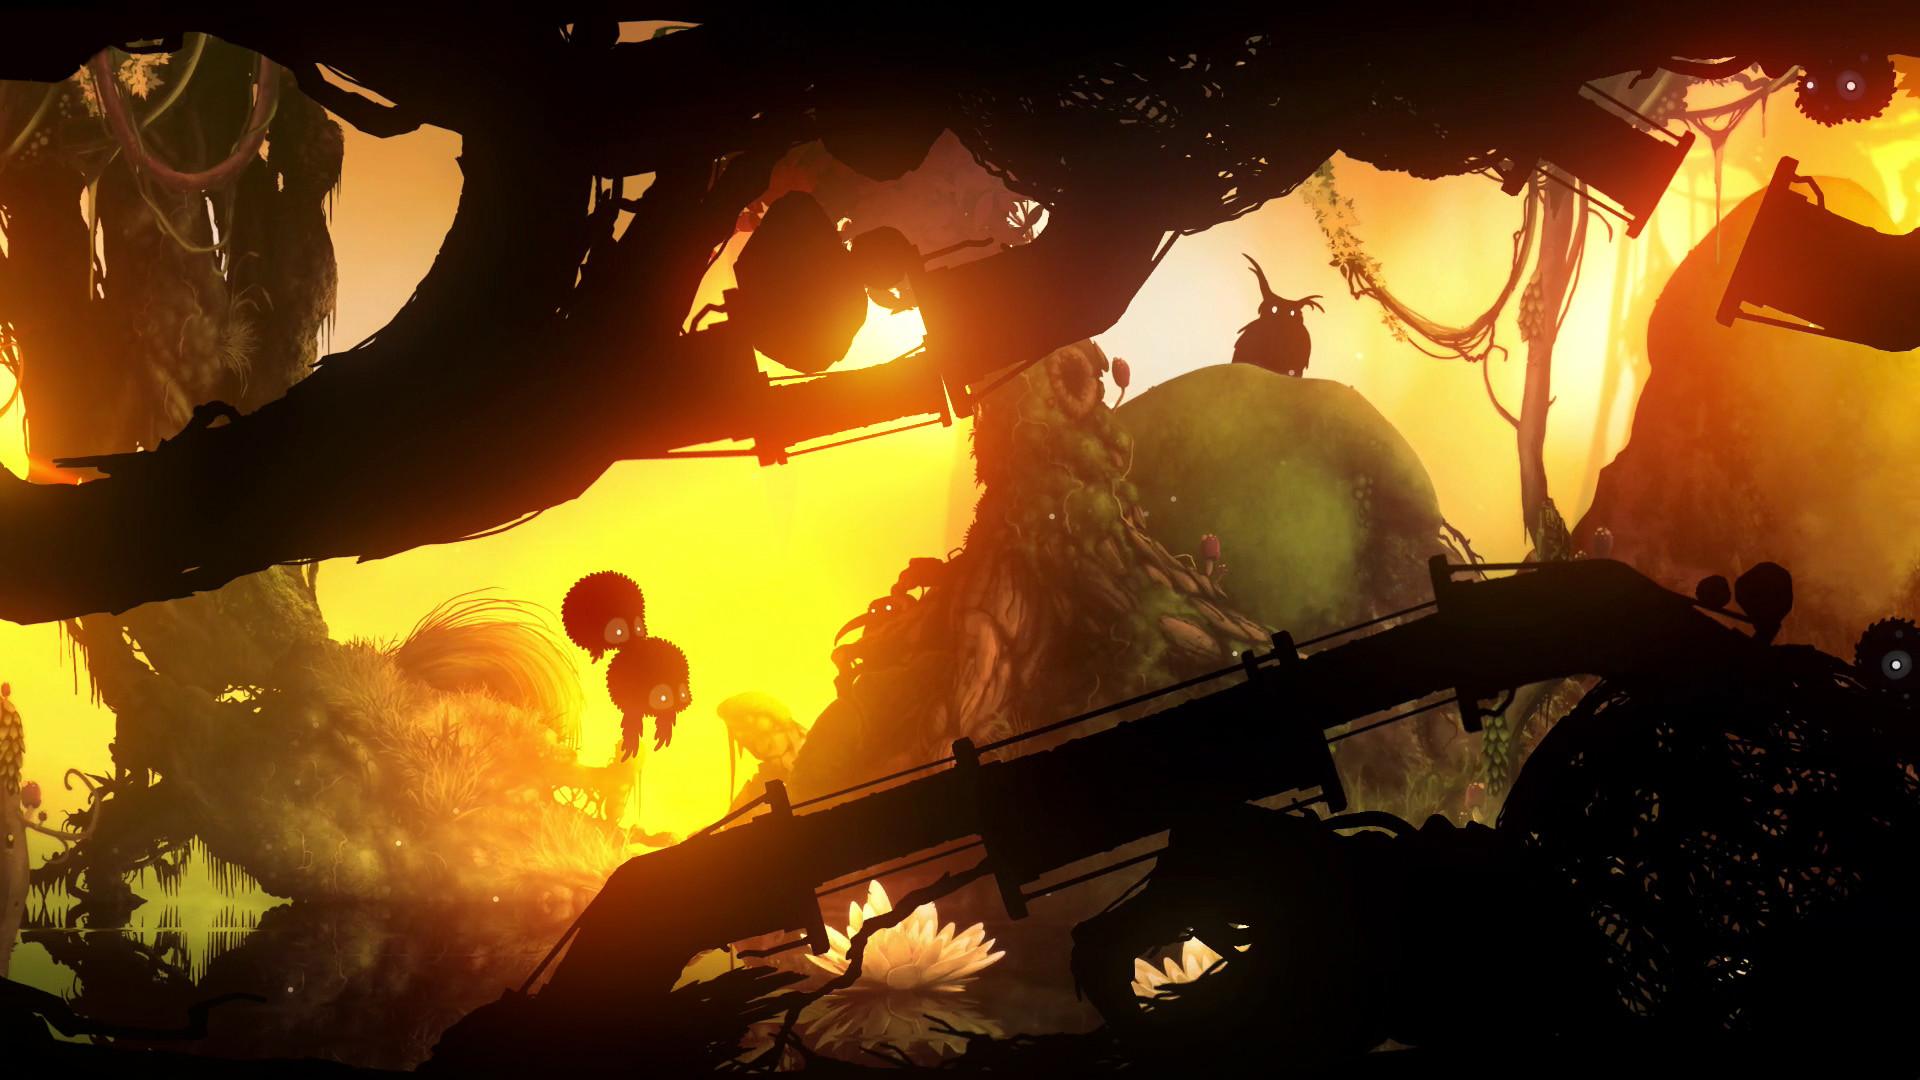 BADLAND: Game of the Year Edition - Imagem 1 do software